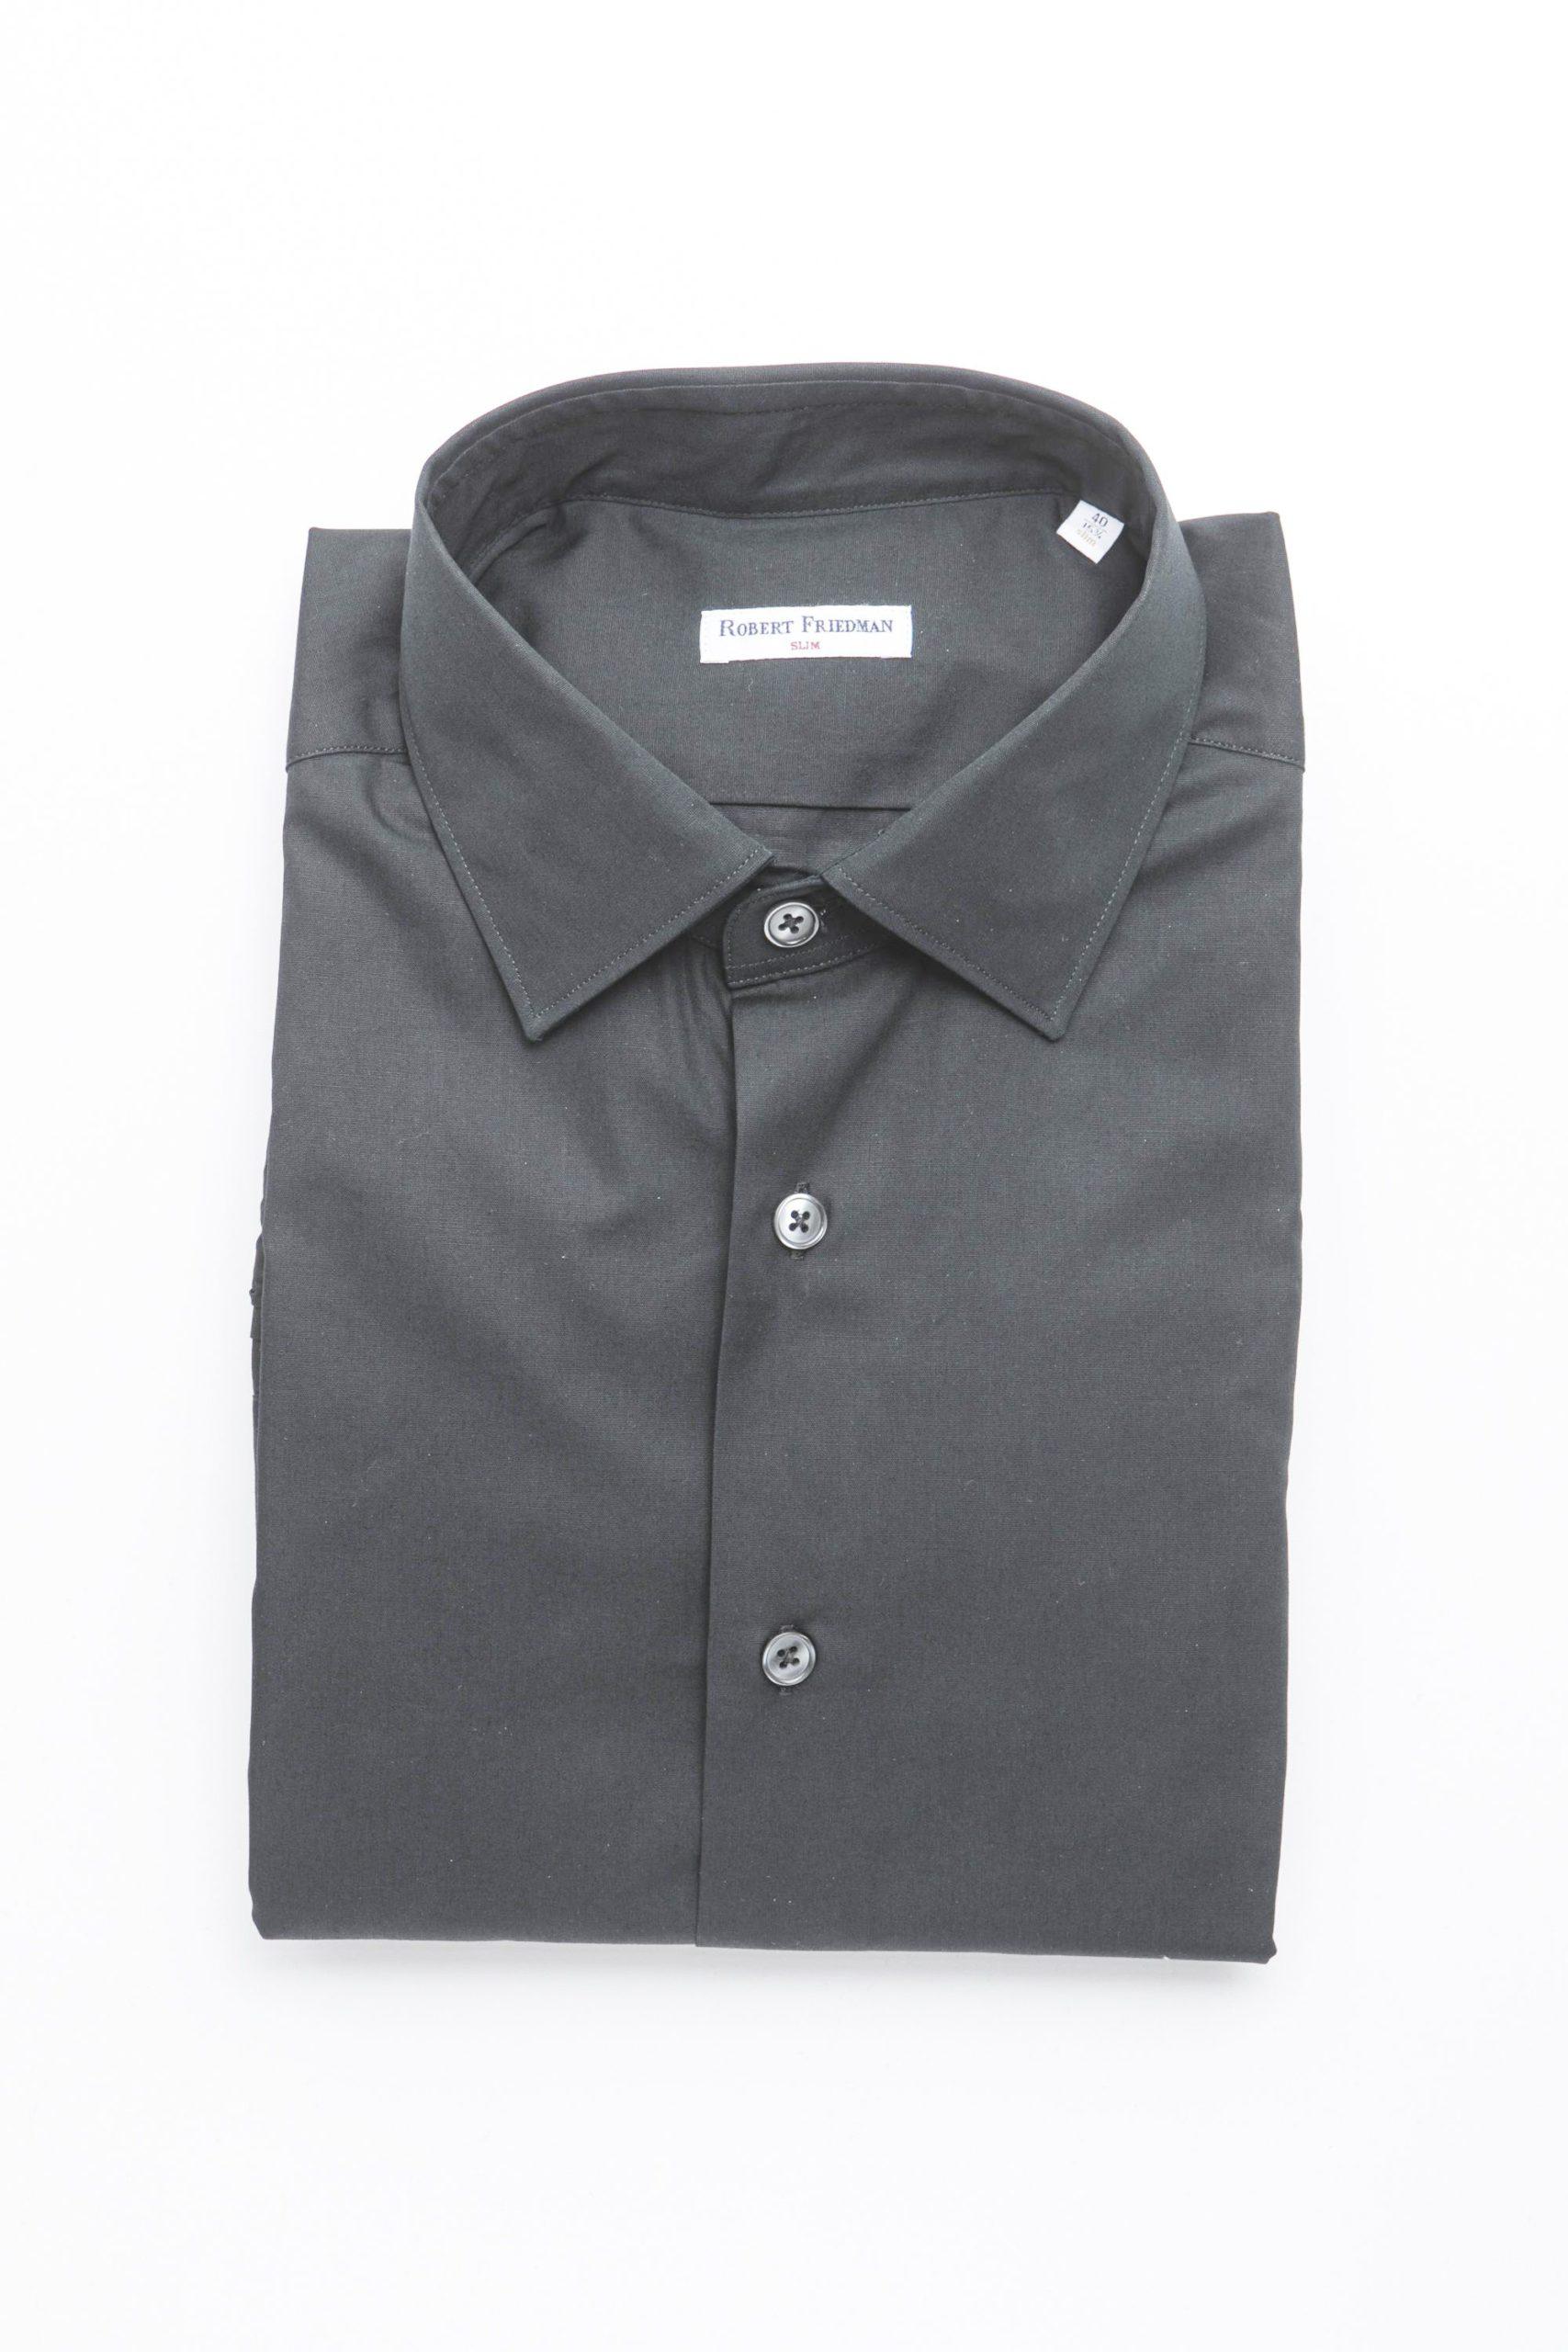 Robert Friedman Men's Shirt Black RO1395005 - IT46 | S